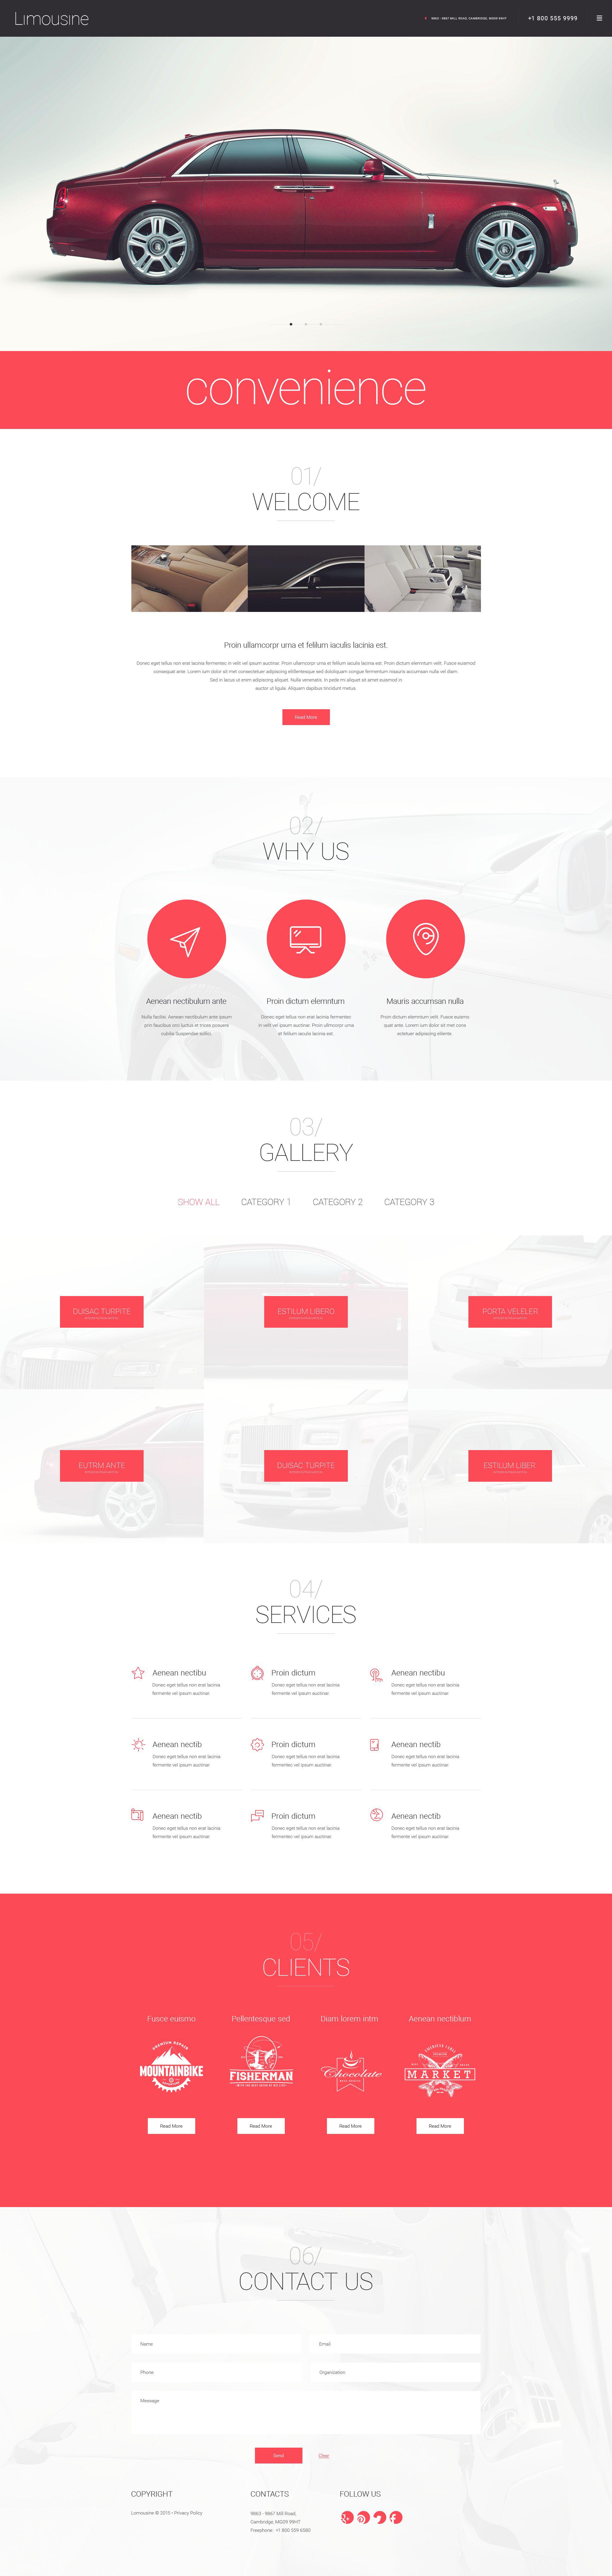 """Limousine"" thème WordPress adaptatif #55049 - screenshot"